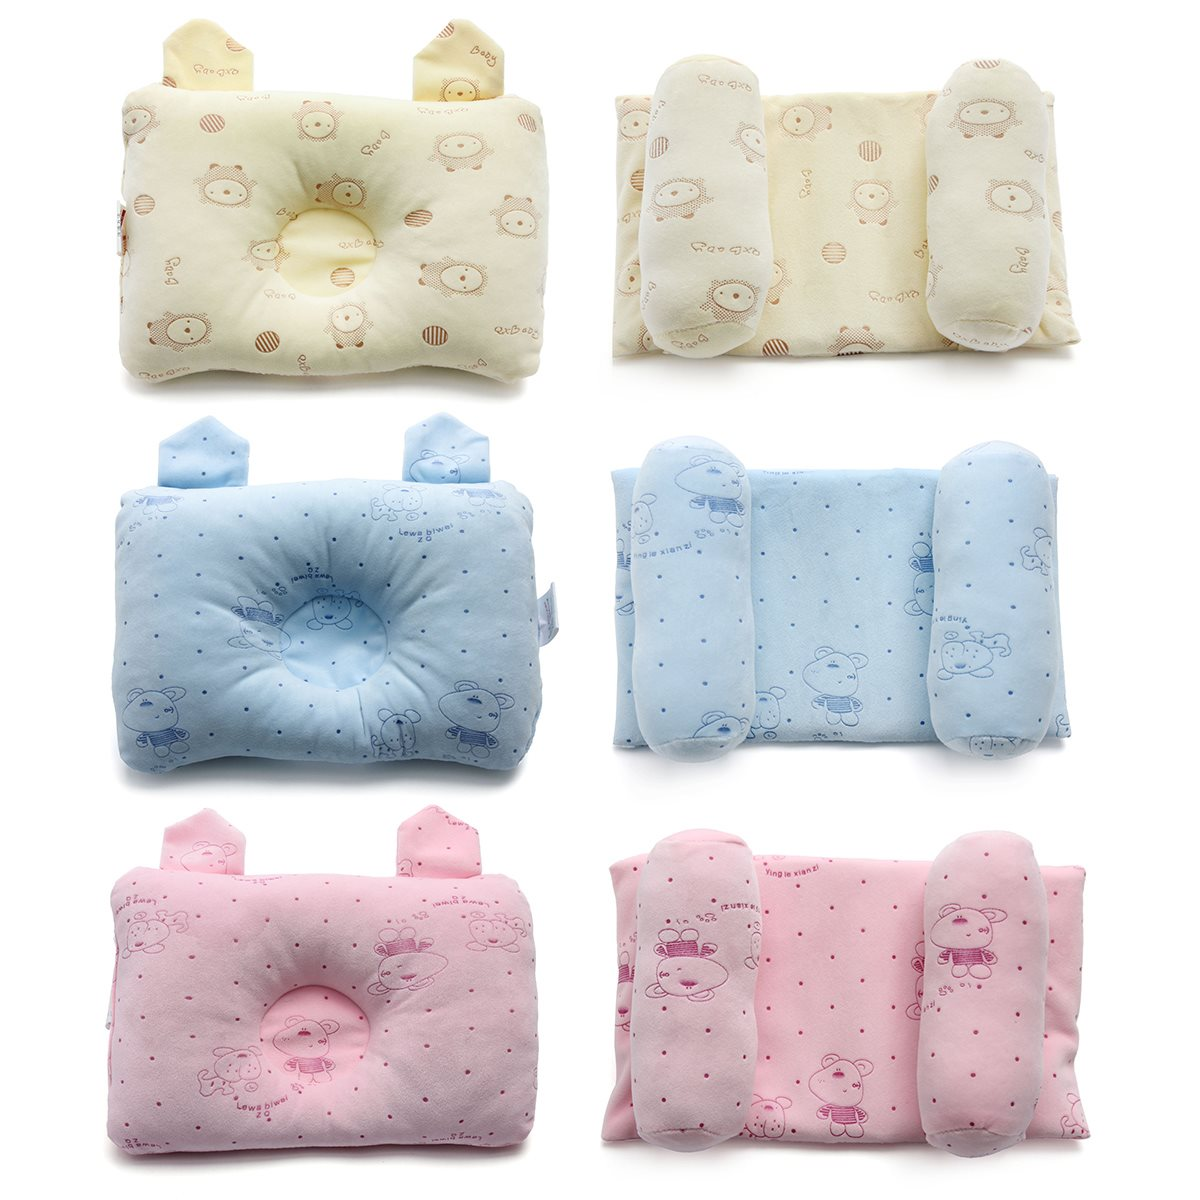 Newborn Baby Cartoon Cot Pillow Children Flat Head Prevent Sleep Cushion Pad Positioner Shaping Pillow Baby Bedding Supplies